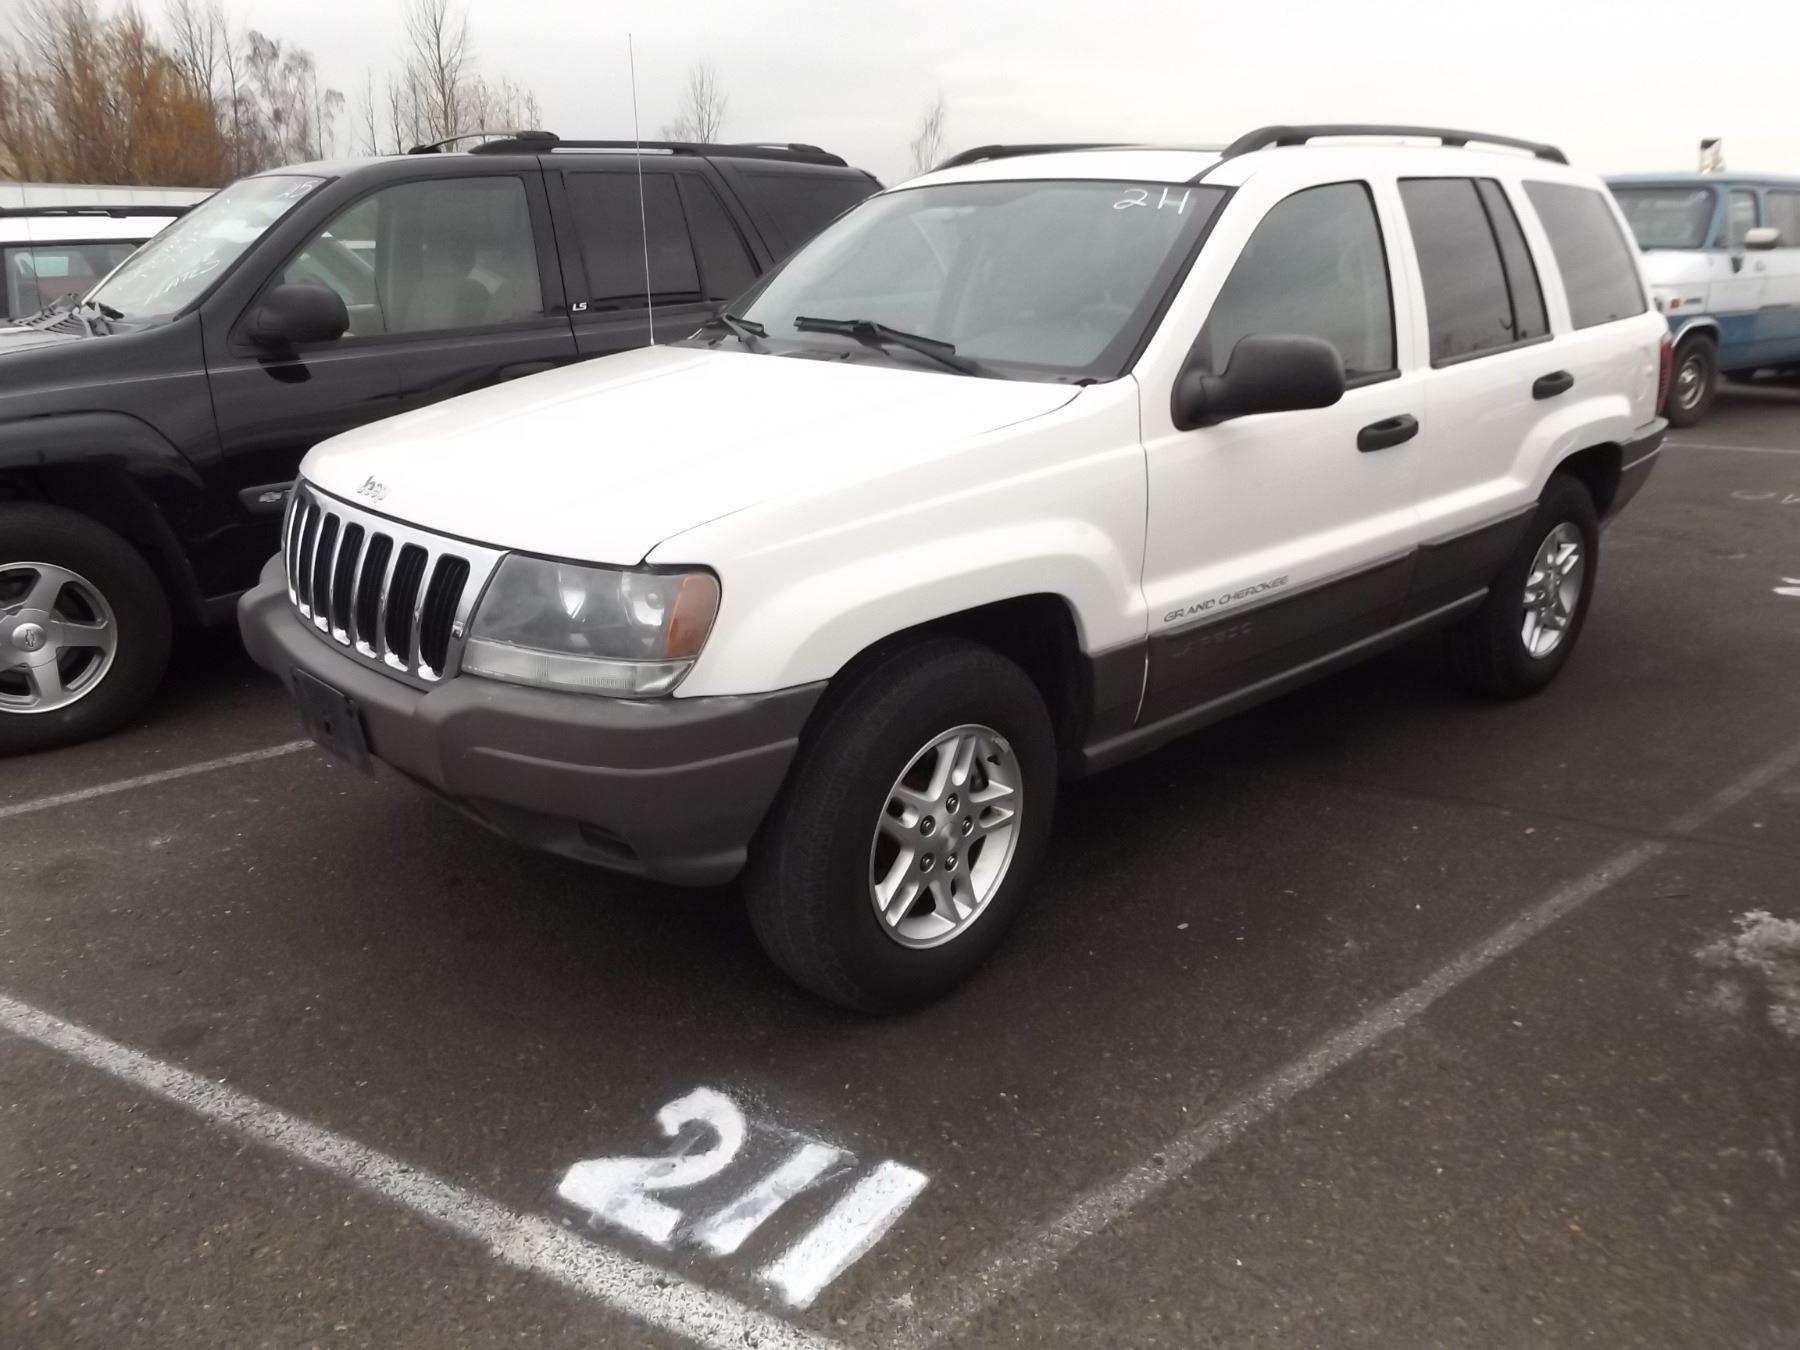 Image 1 : 2003 Jeep Grand Cherokee ...